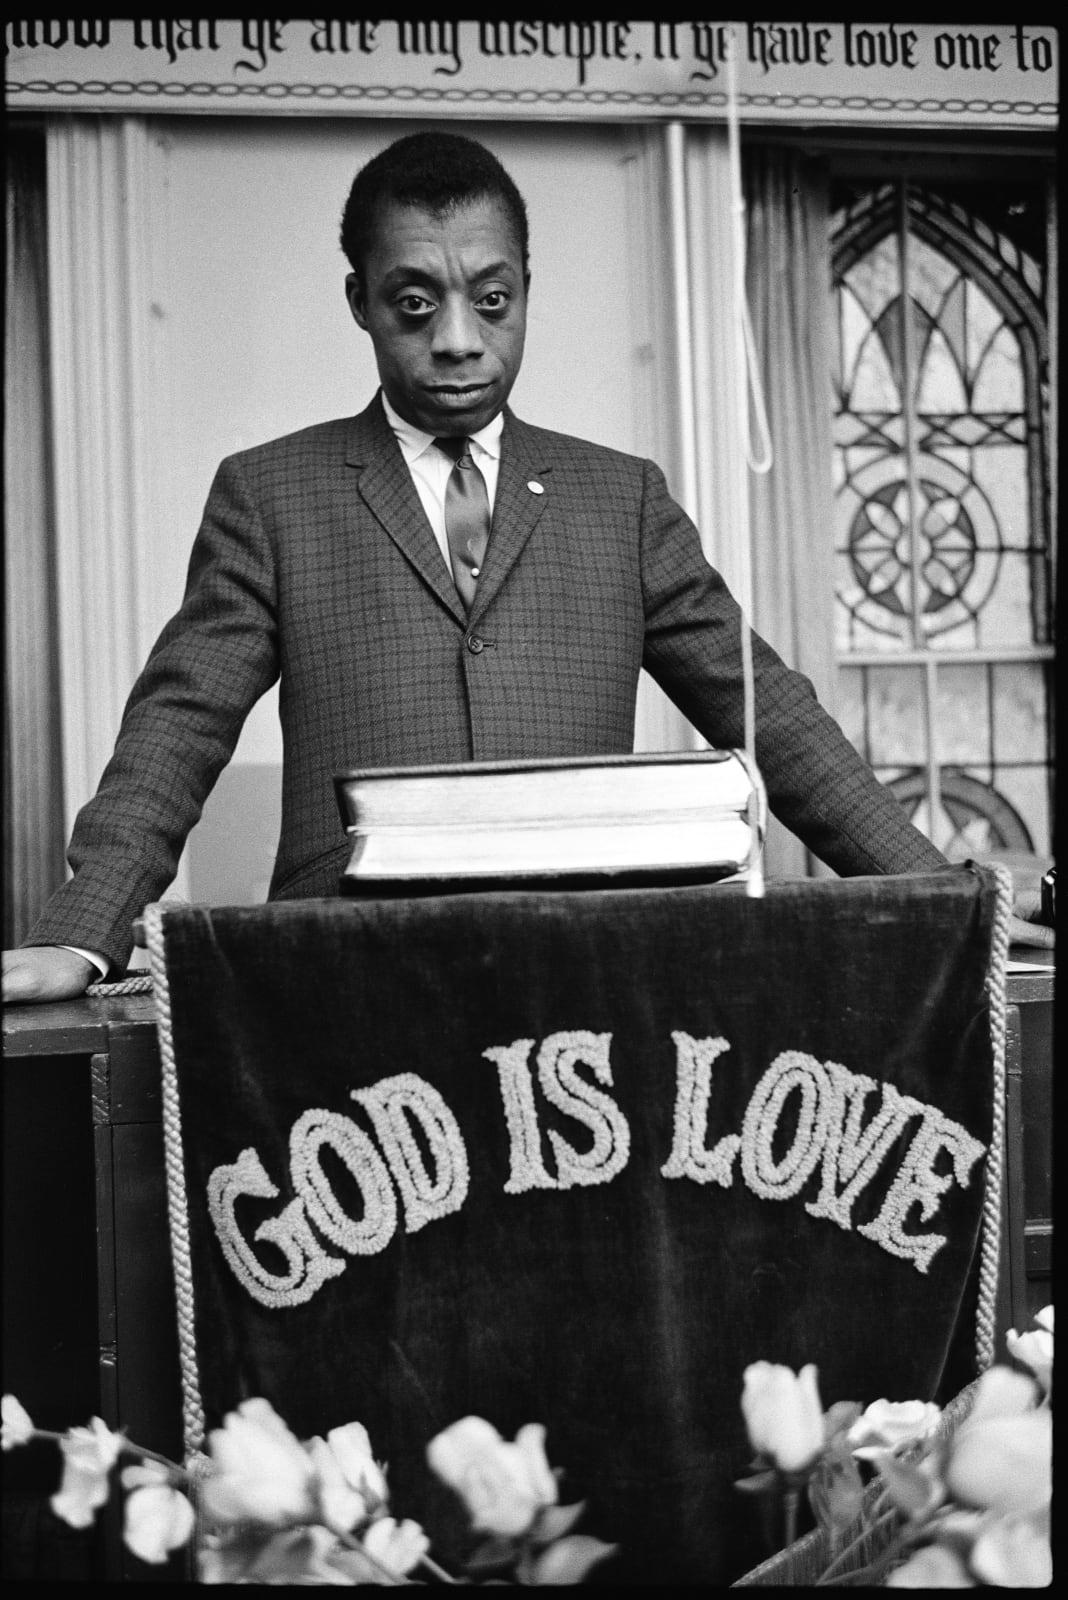 Steve Schapiro James Baldwin, God Is Love, Harlem, 1963